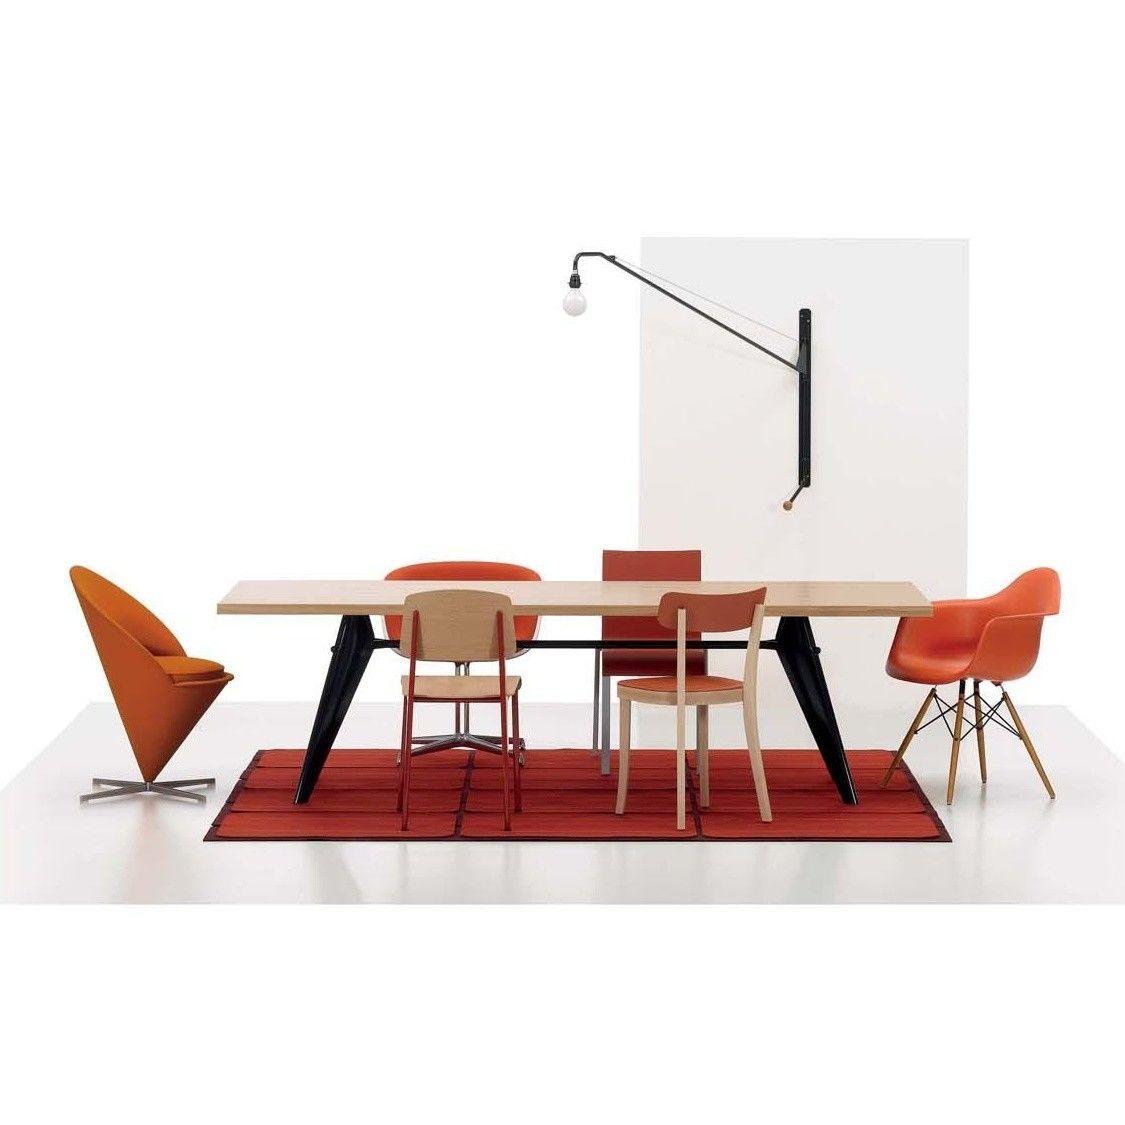 potence applique murale vitra. Black Bedroom Furniture Sets. Home Design Ideas